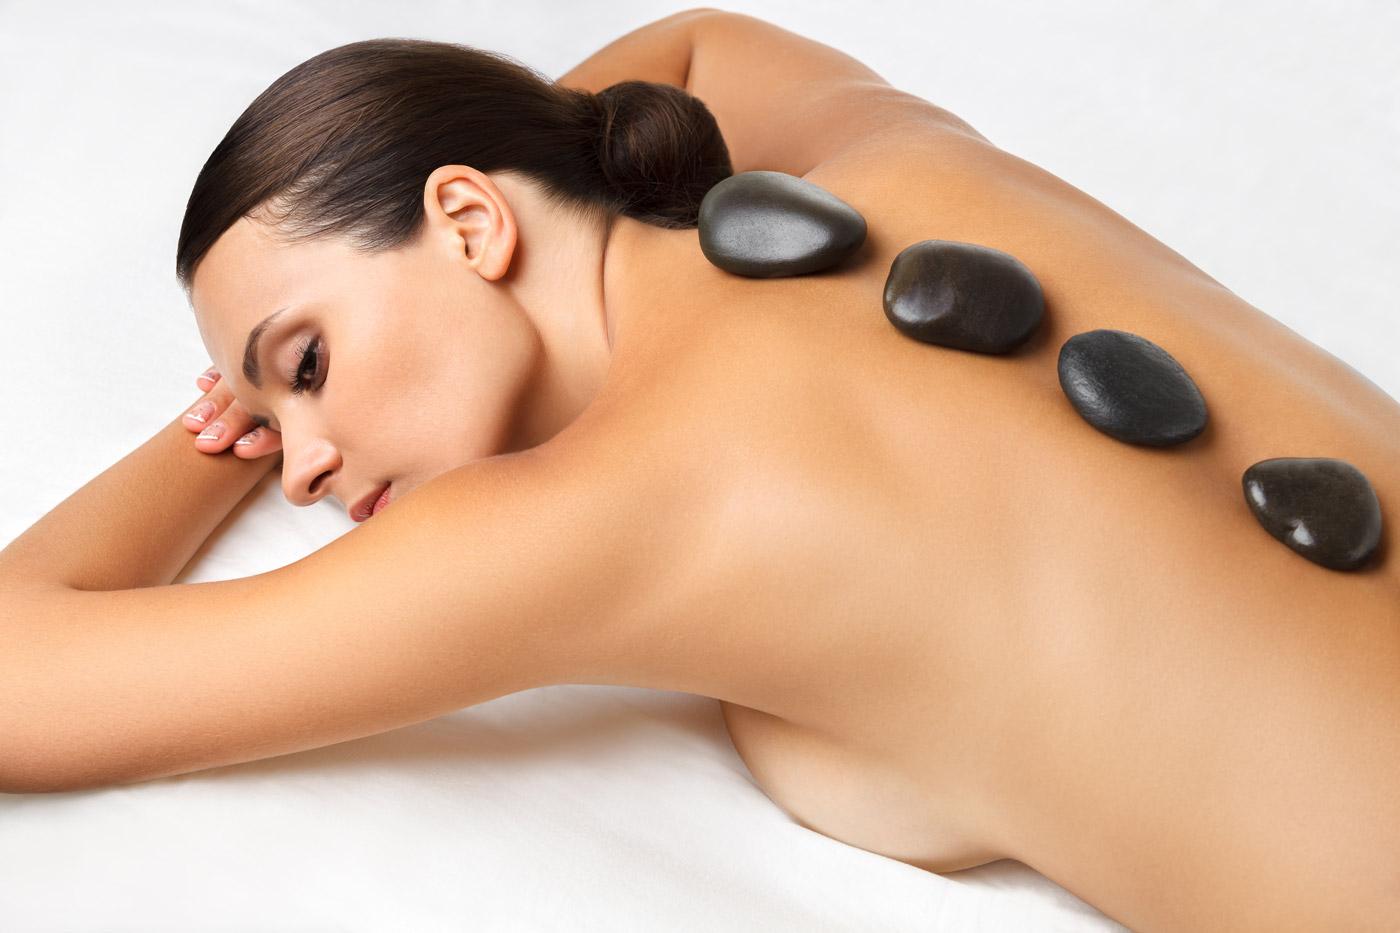 massage partille kontaktannonser sex